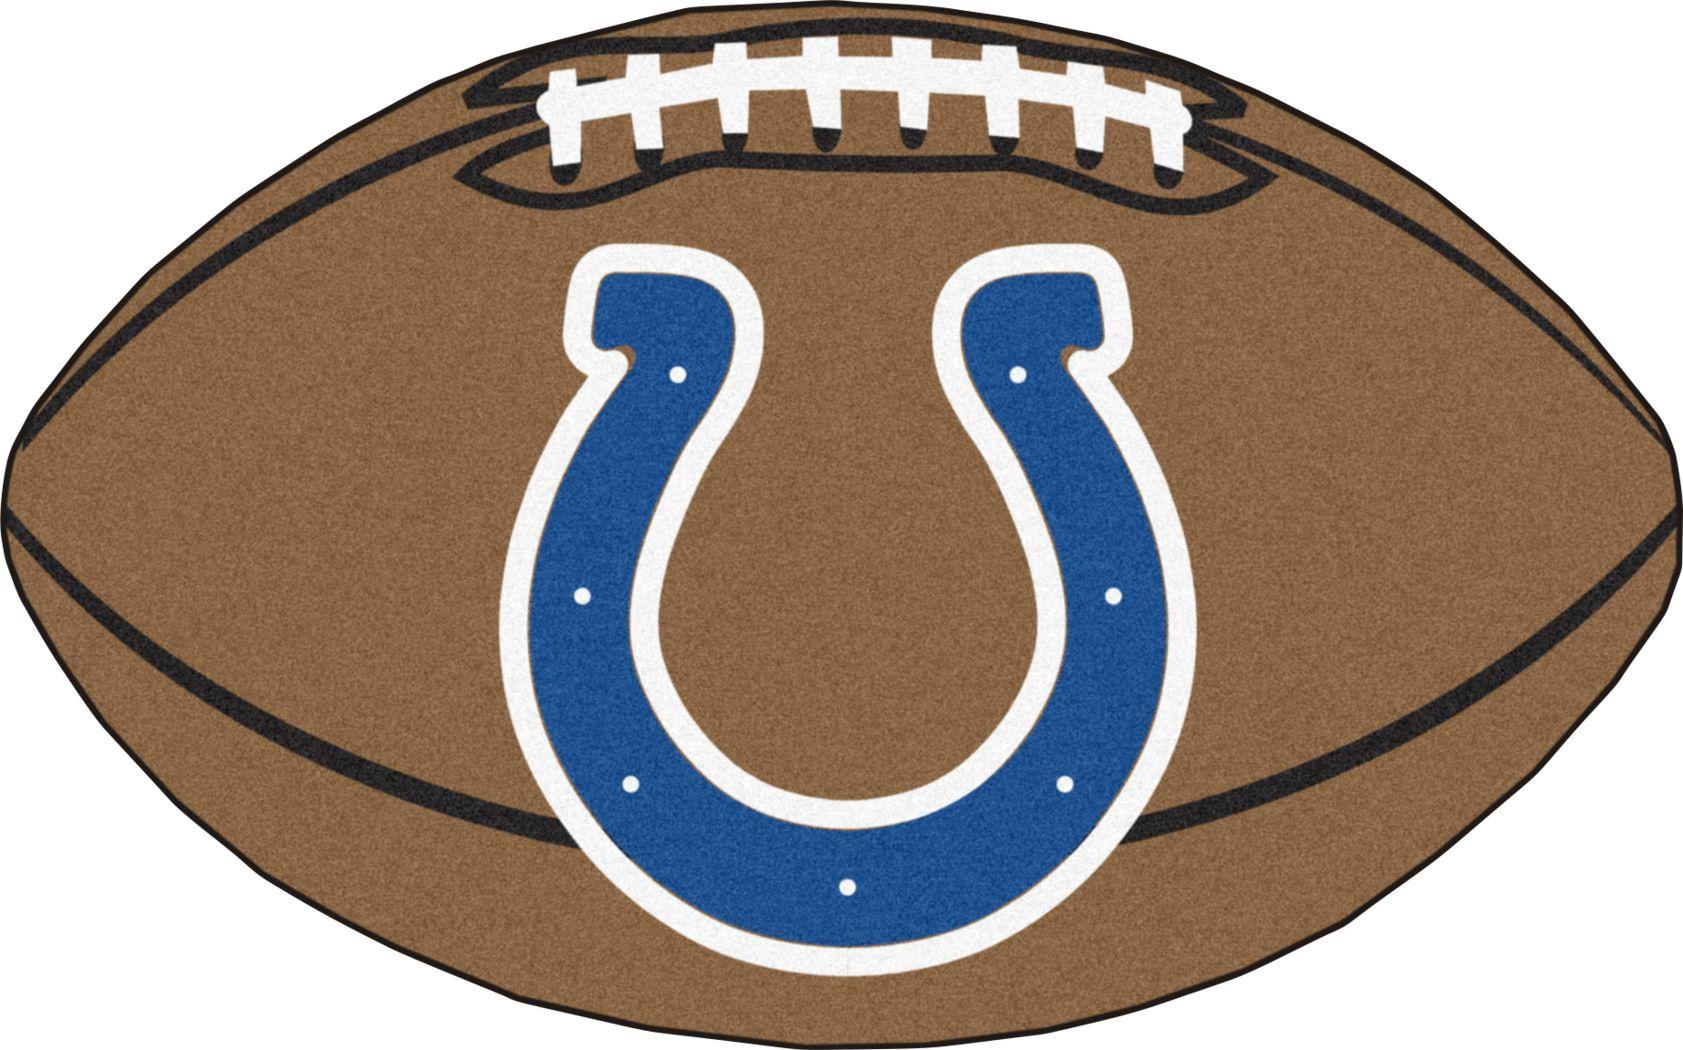 "NFL Football Mascot Indianapolis Colts 1'6""x 1'10"" Rug"